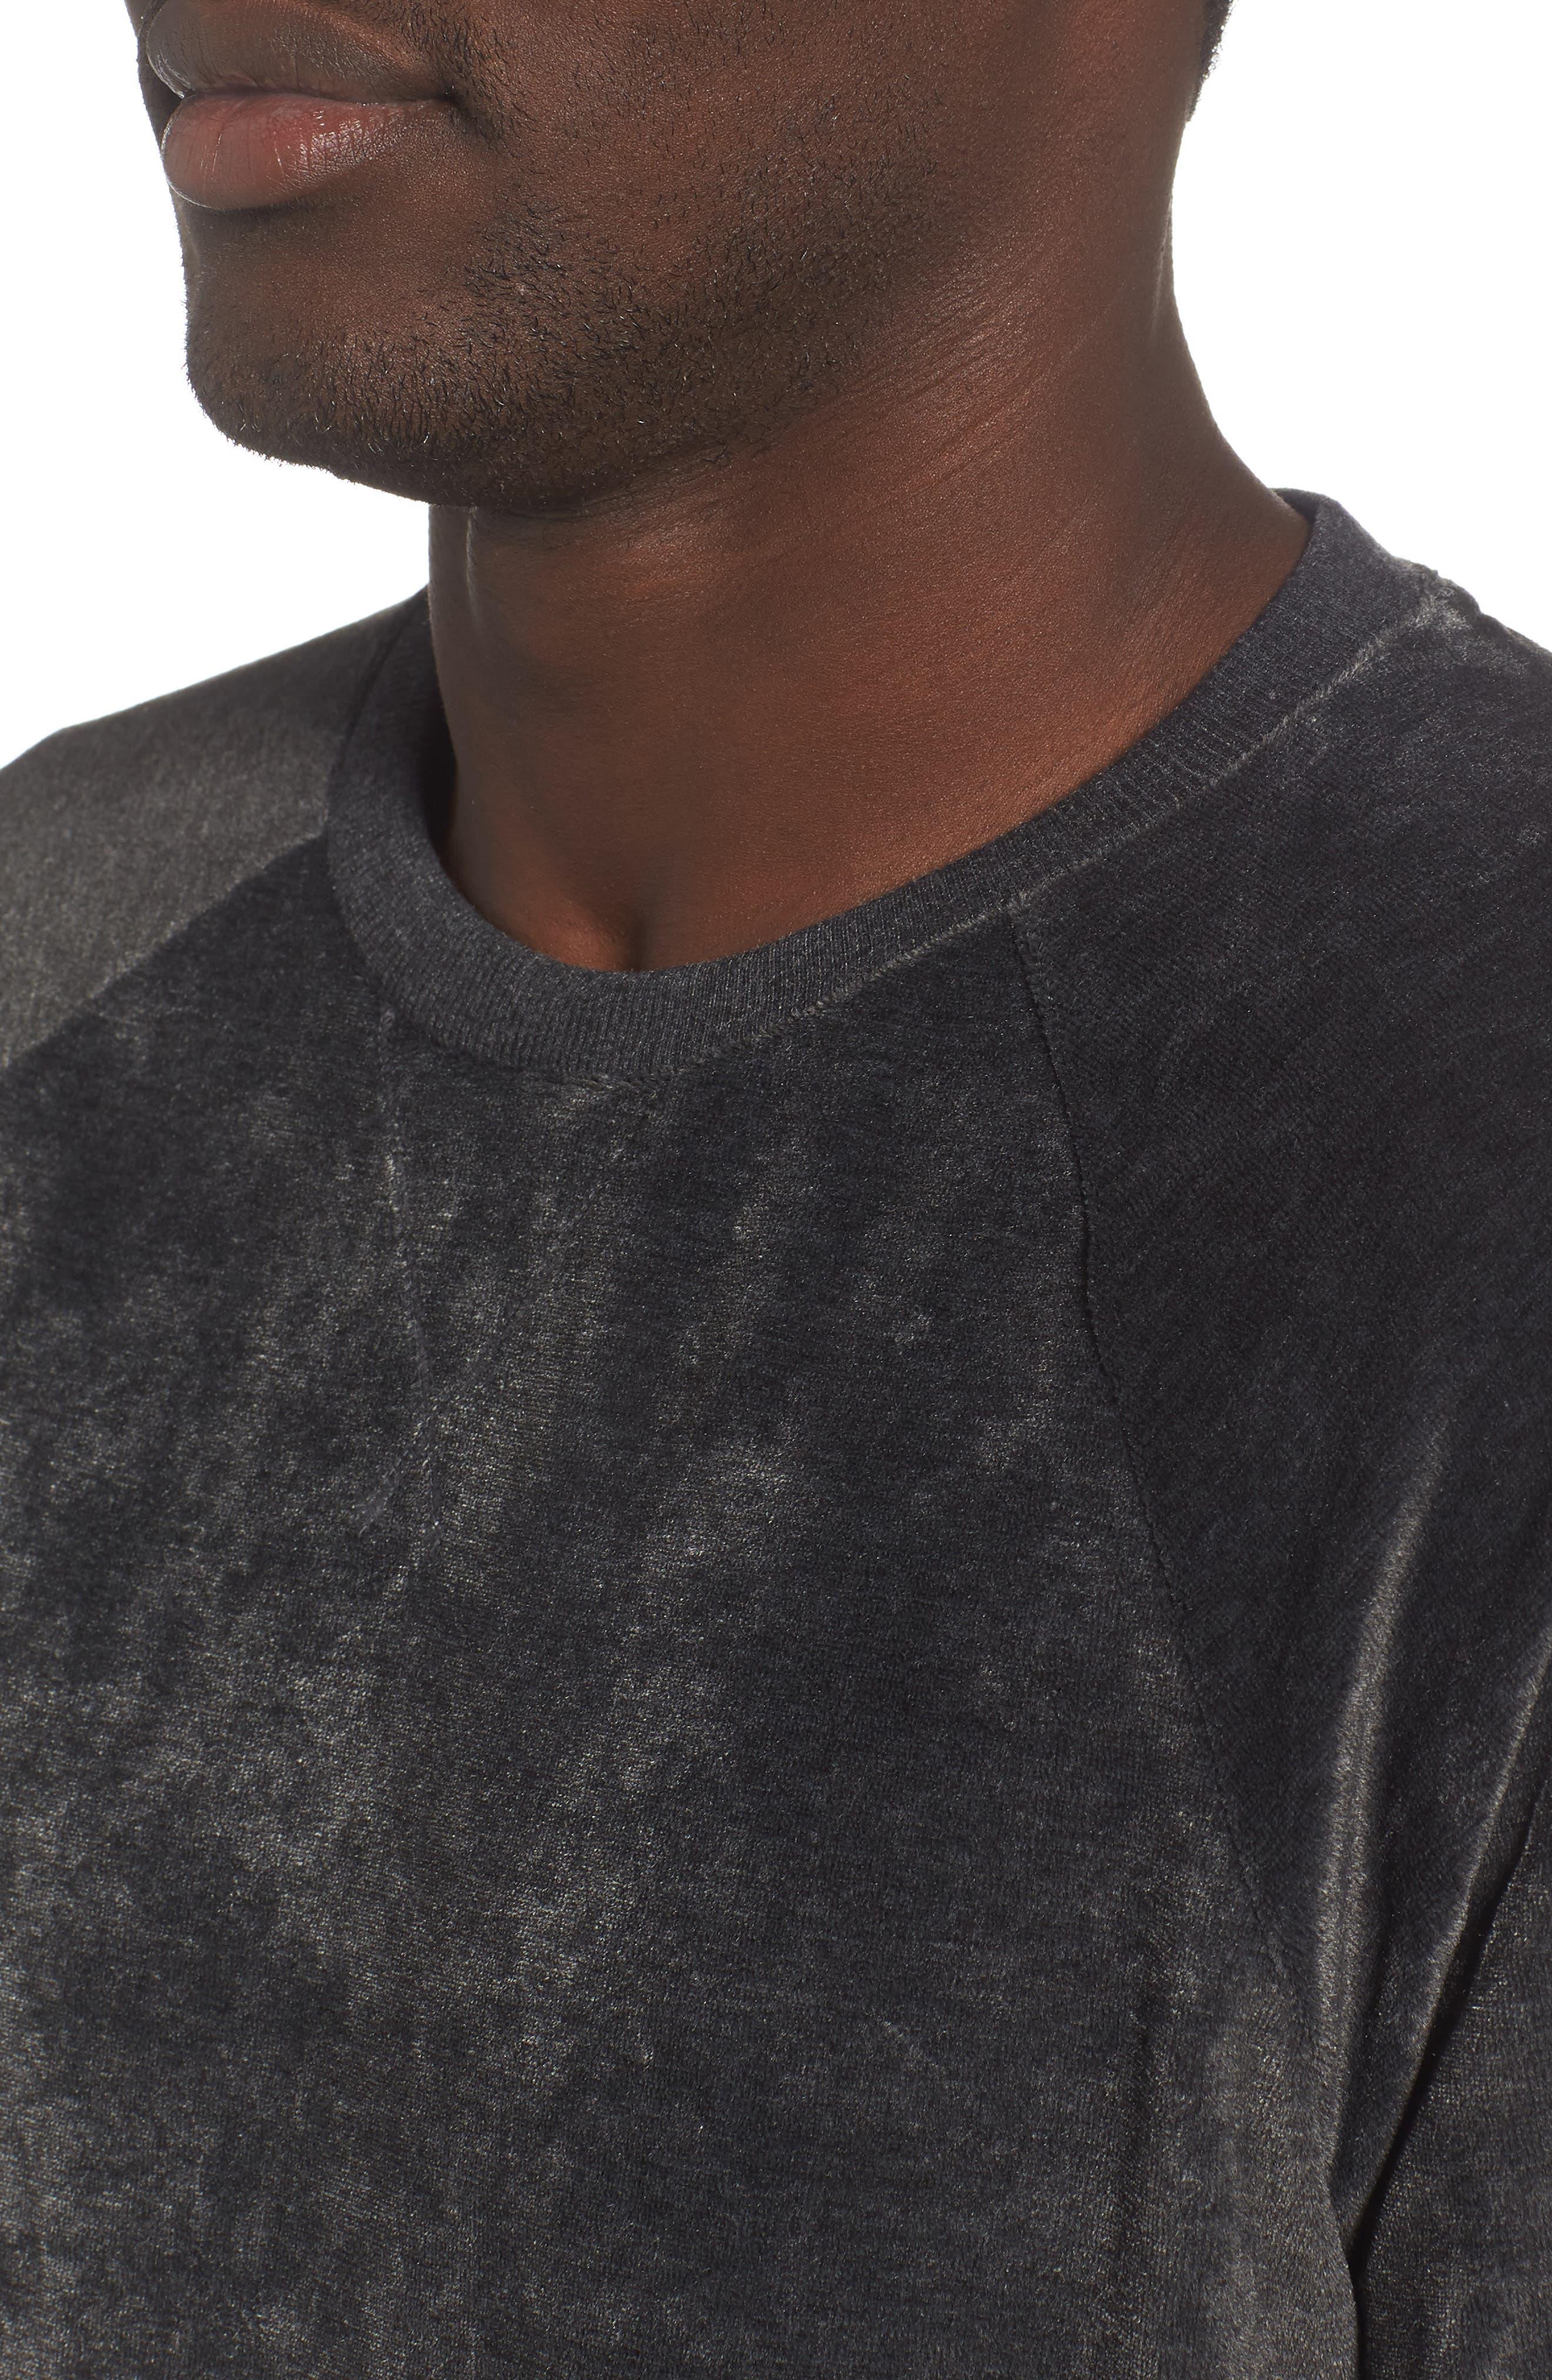 Crewneck Sweatshirt,                             Alternate thumbnail 4, color,                             WASHED BLACK